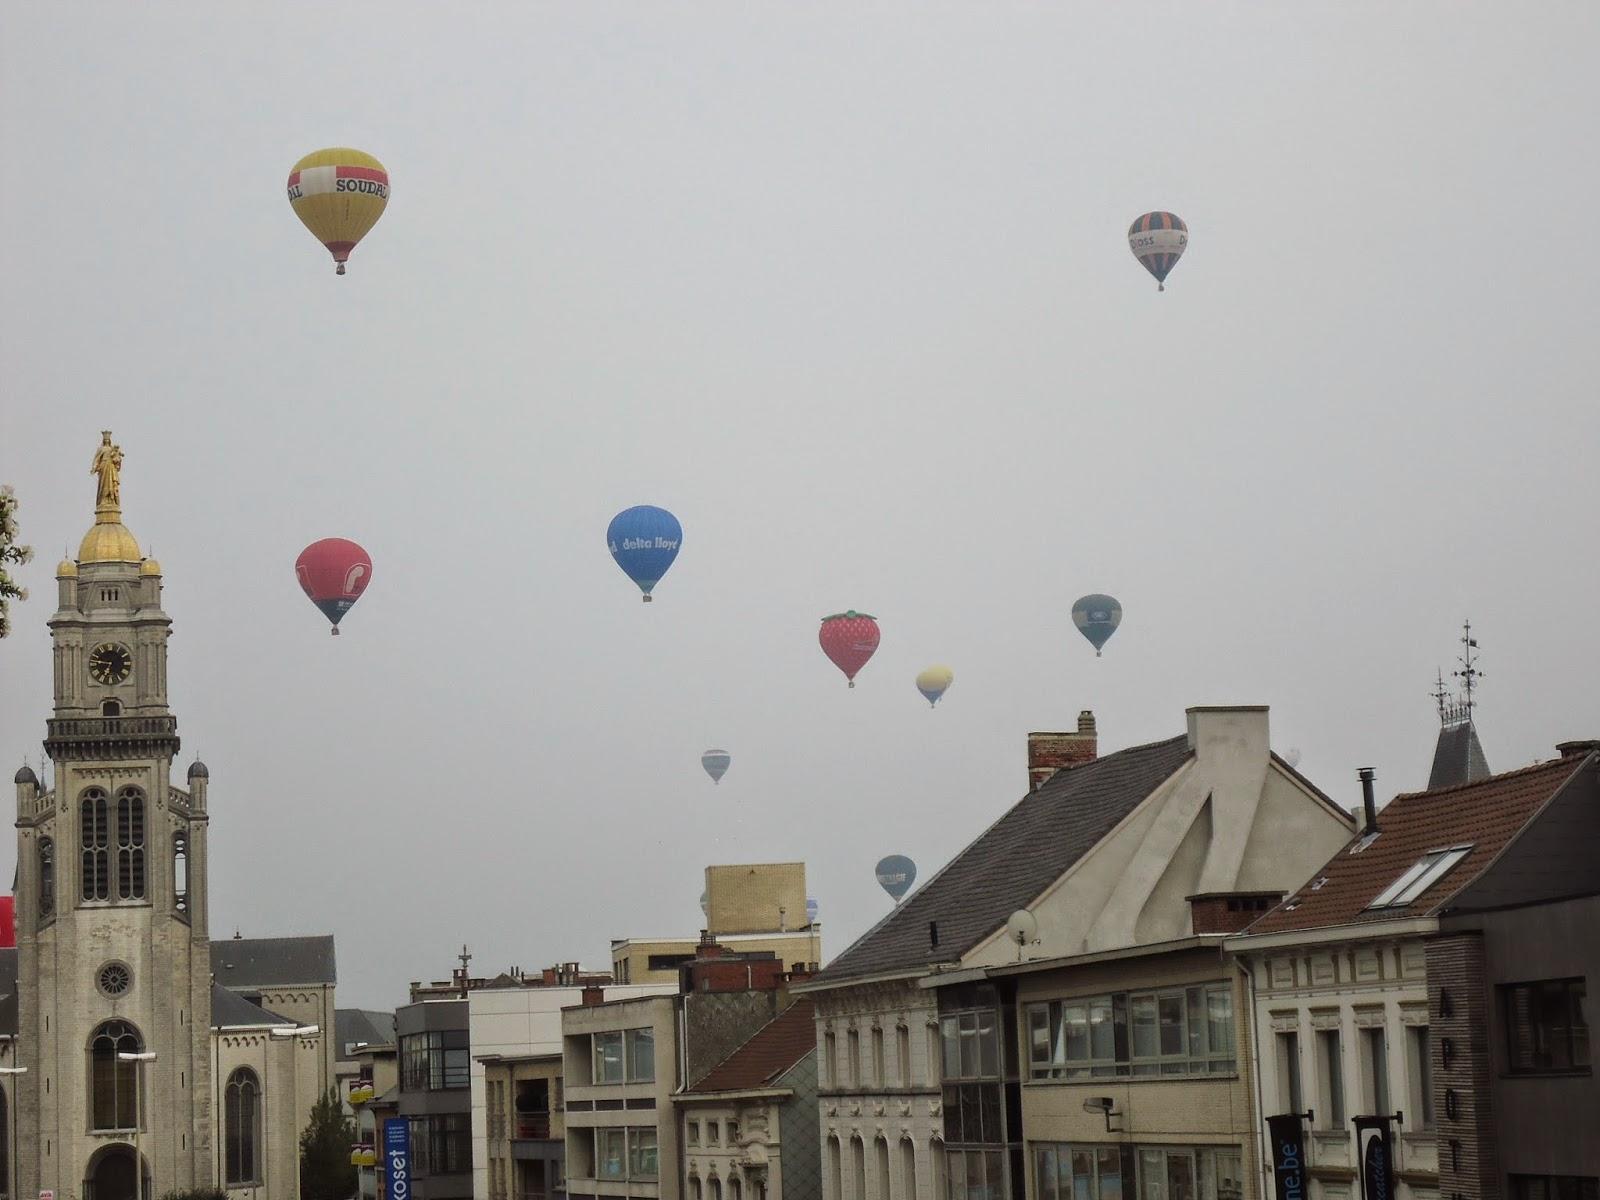 Travel Sint-Niklaas Peace Festivities Ballooning event Belgium